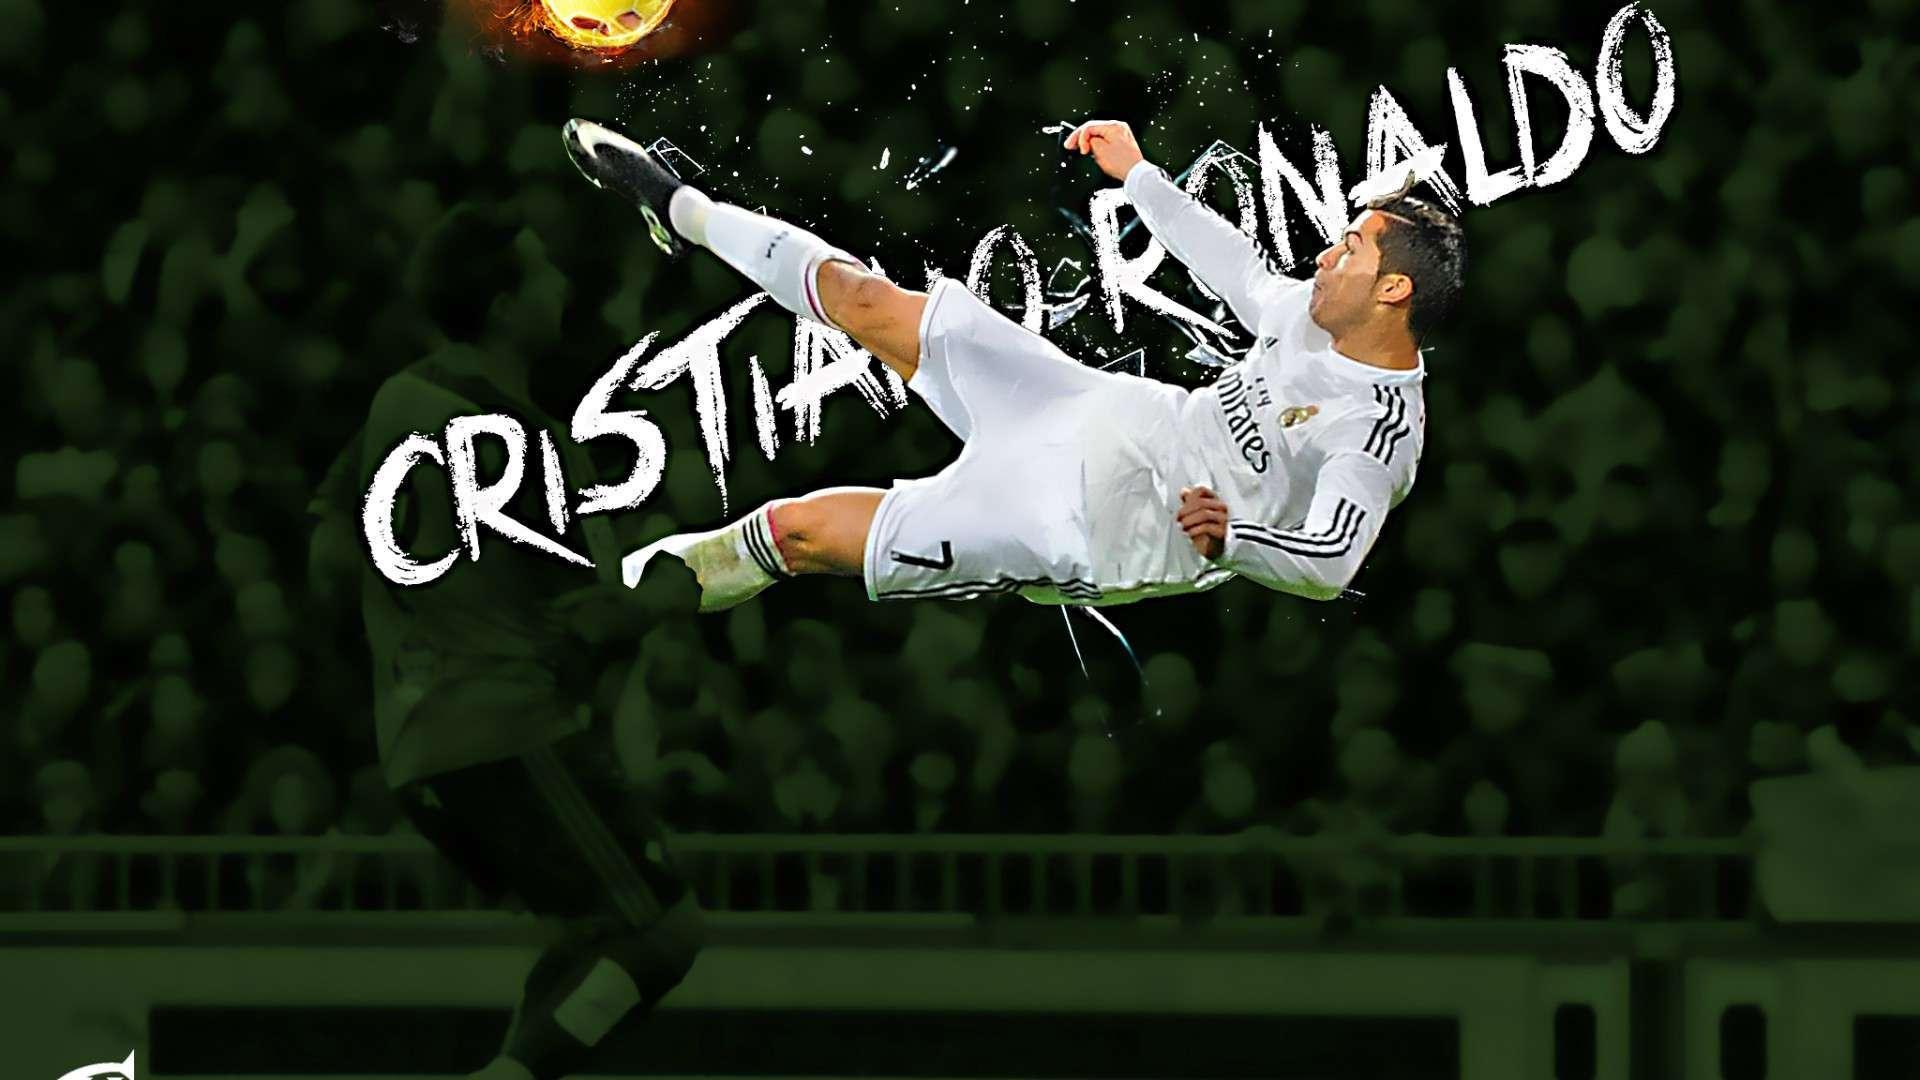 Cristiano Ronaldo Wallpapers Nike Wallpaper 1920x1080